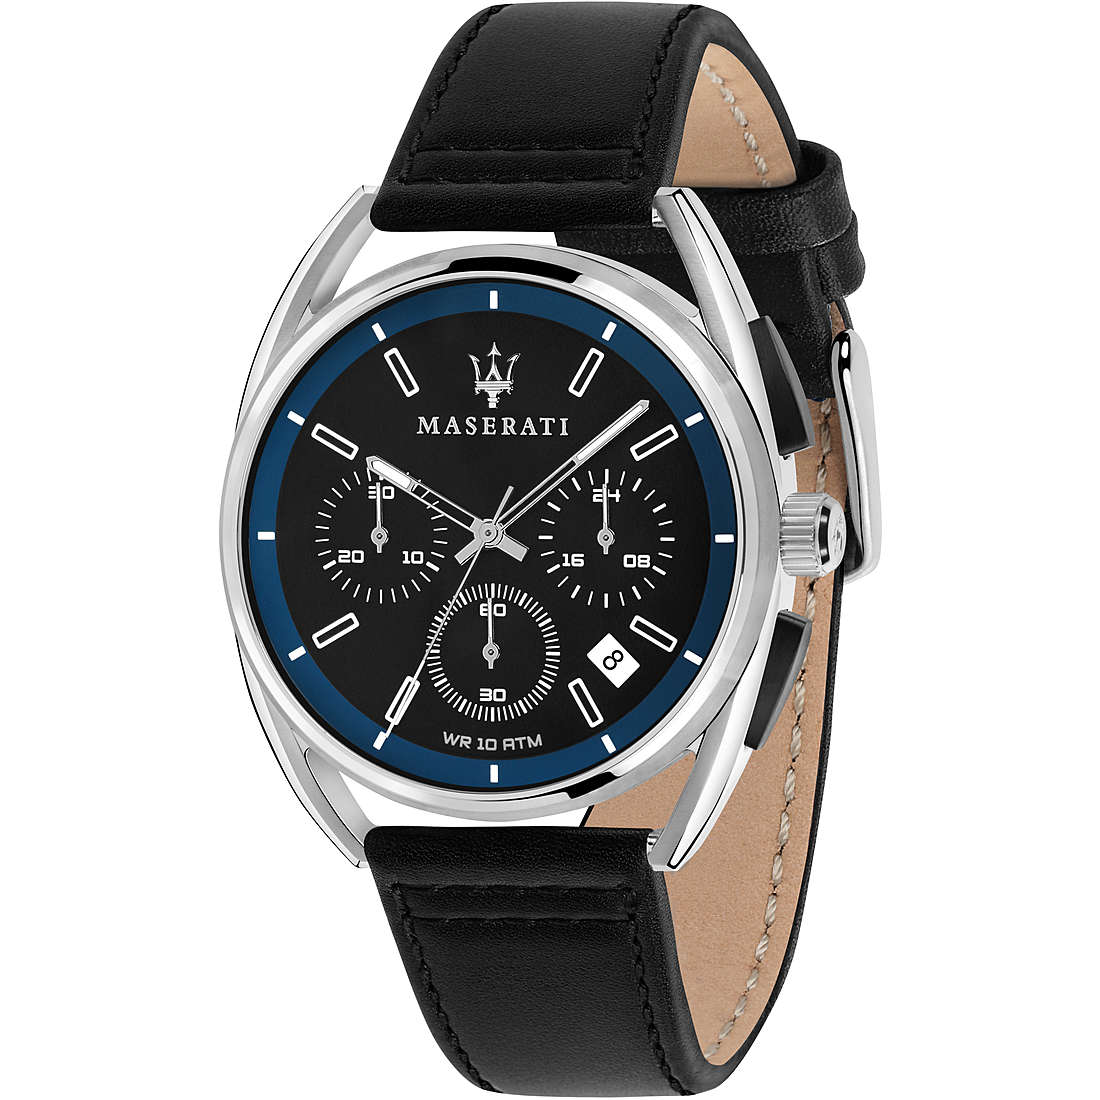 Maserati Men's Trimarano Watch Black R8871632001MK